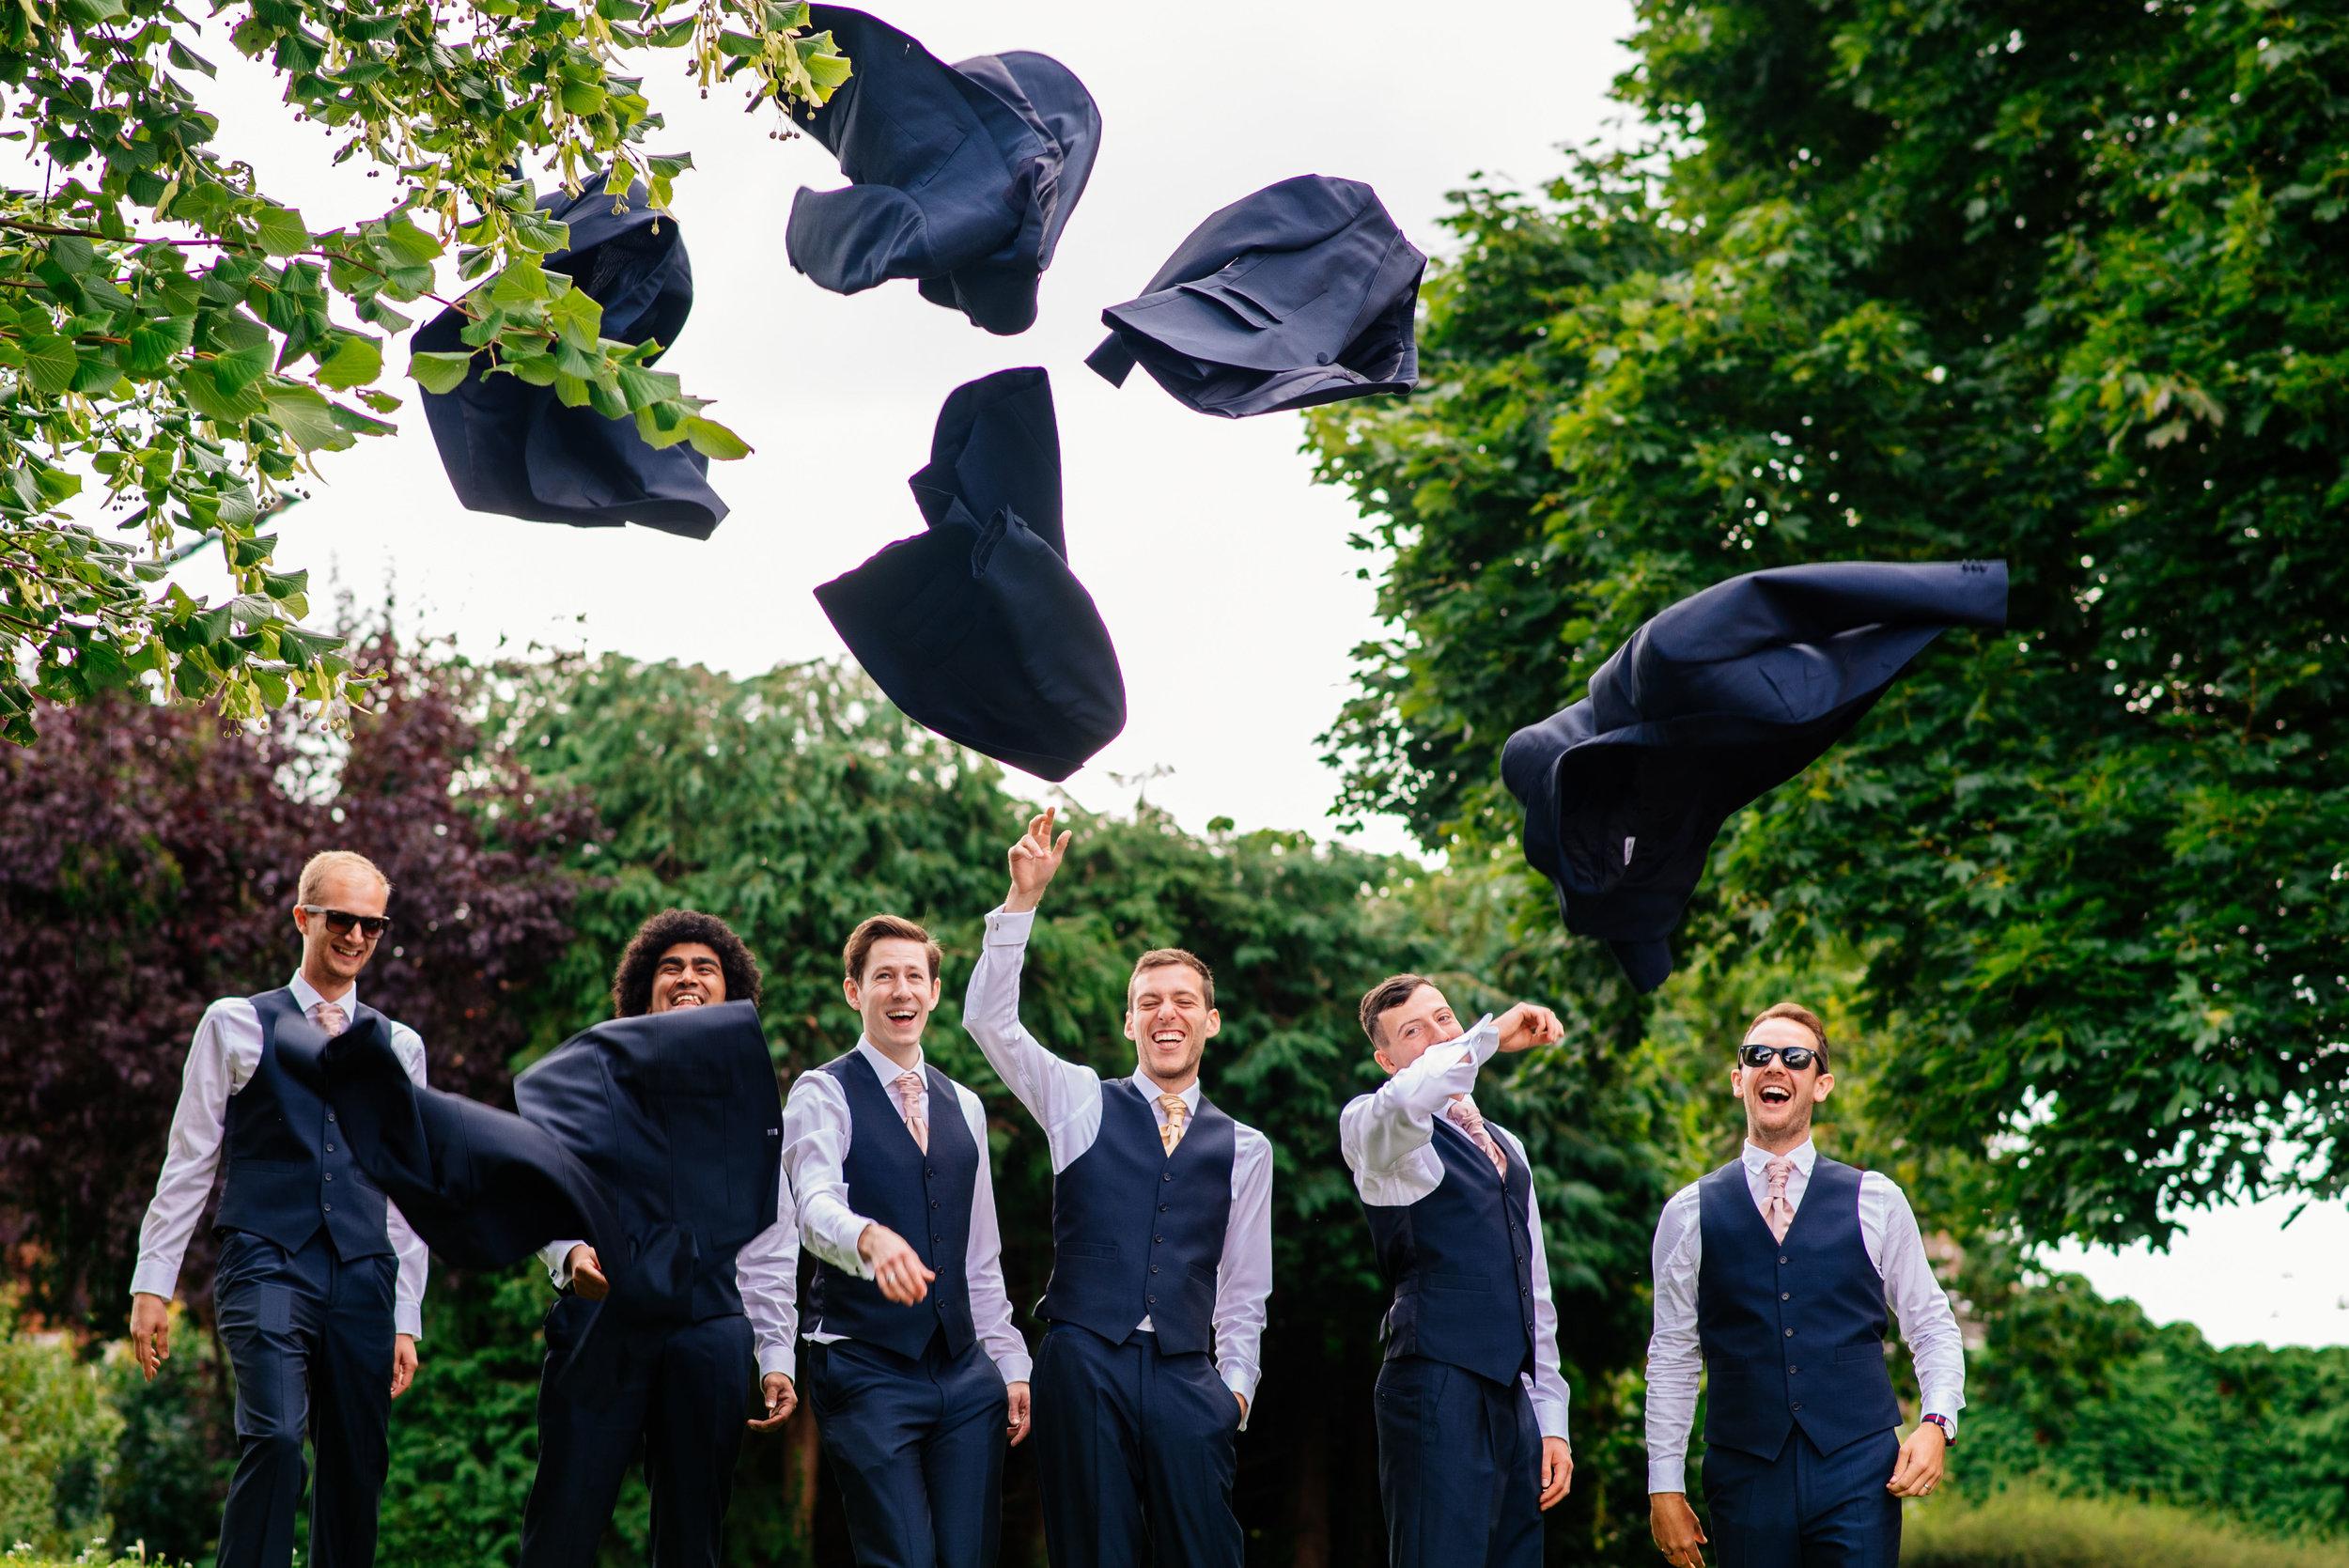 18 Lillibrooke Manor Berkshire Groomsmen Jackets Wedding Photography.jpg